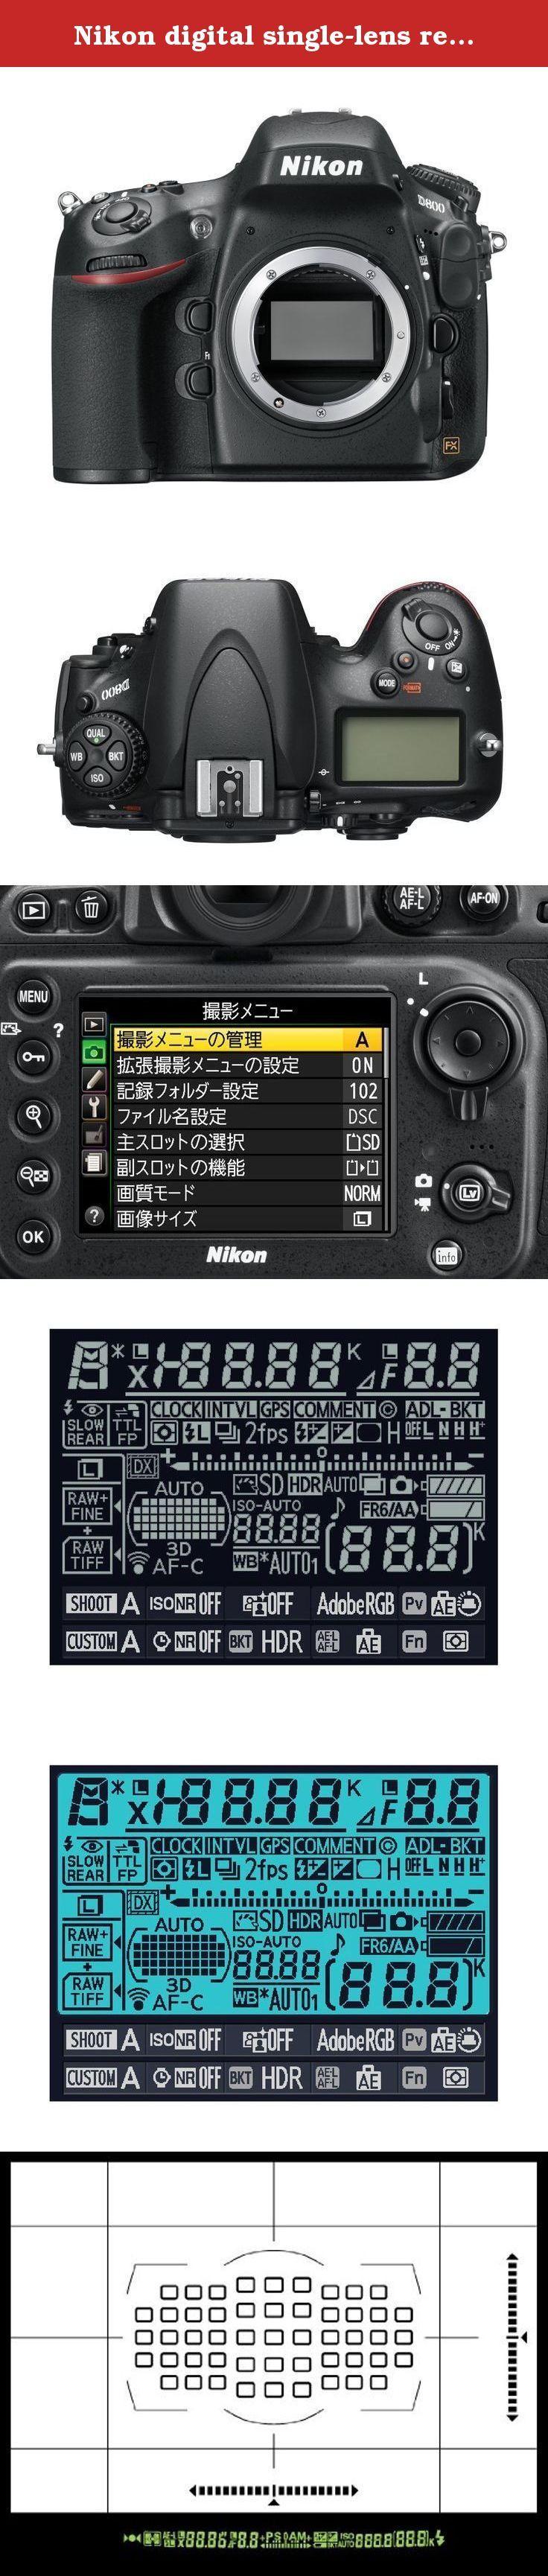 Nikon digital single-lens reflex camera body D800 D800. :.